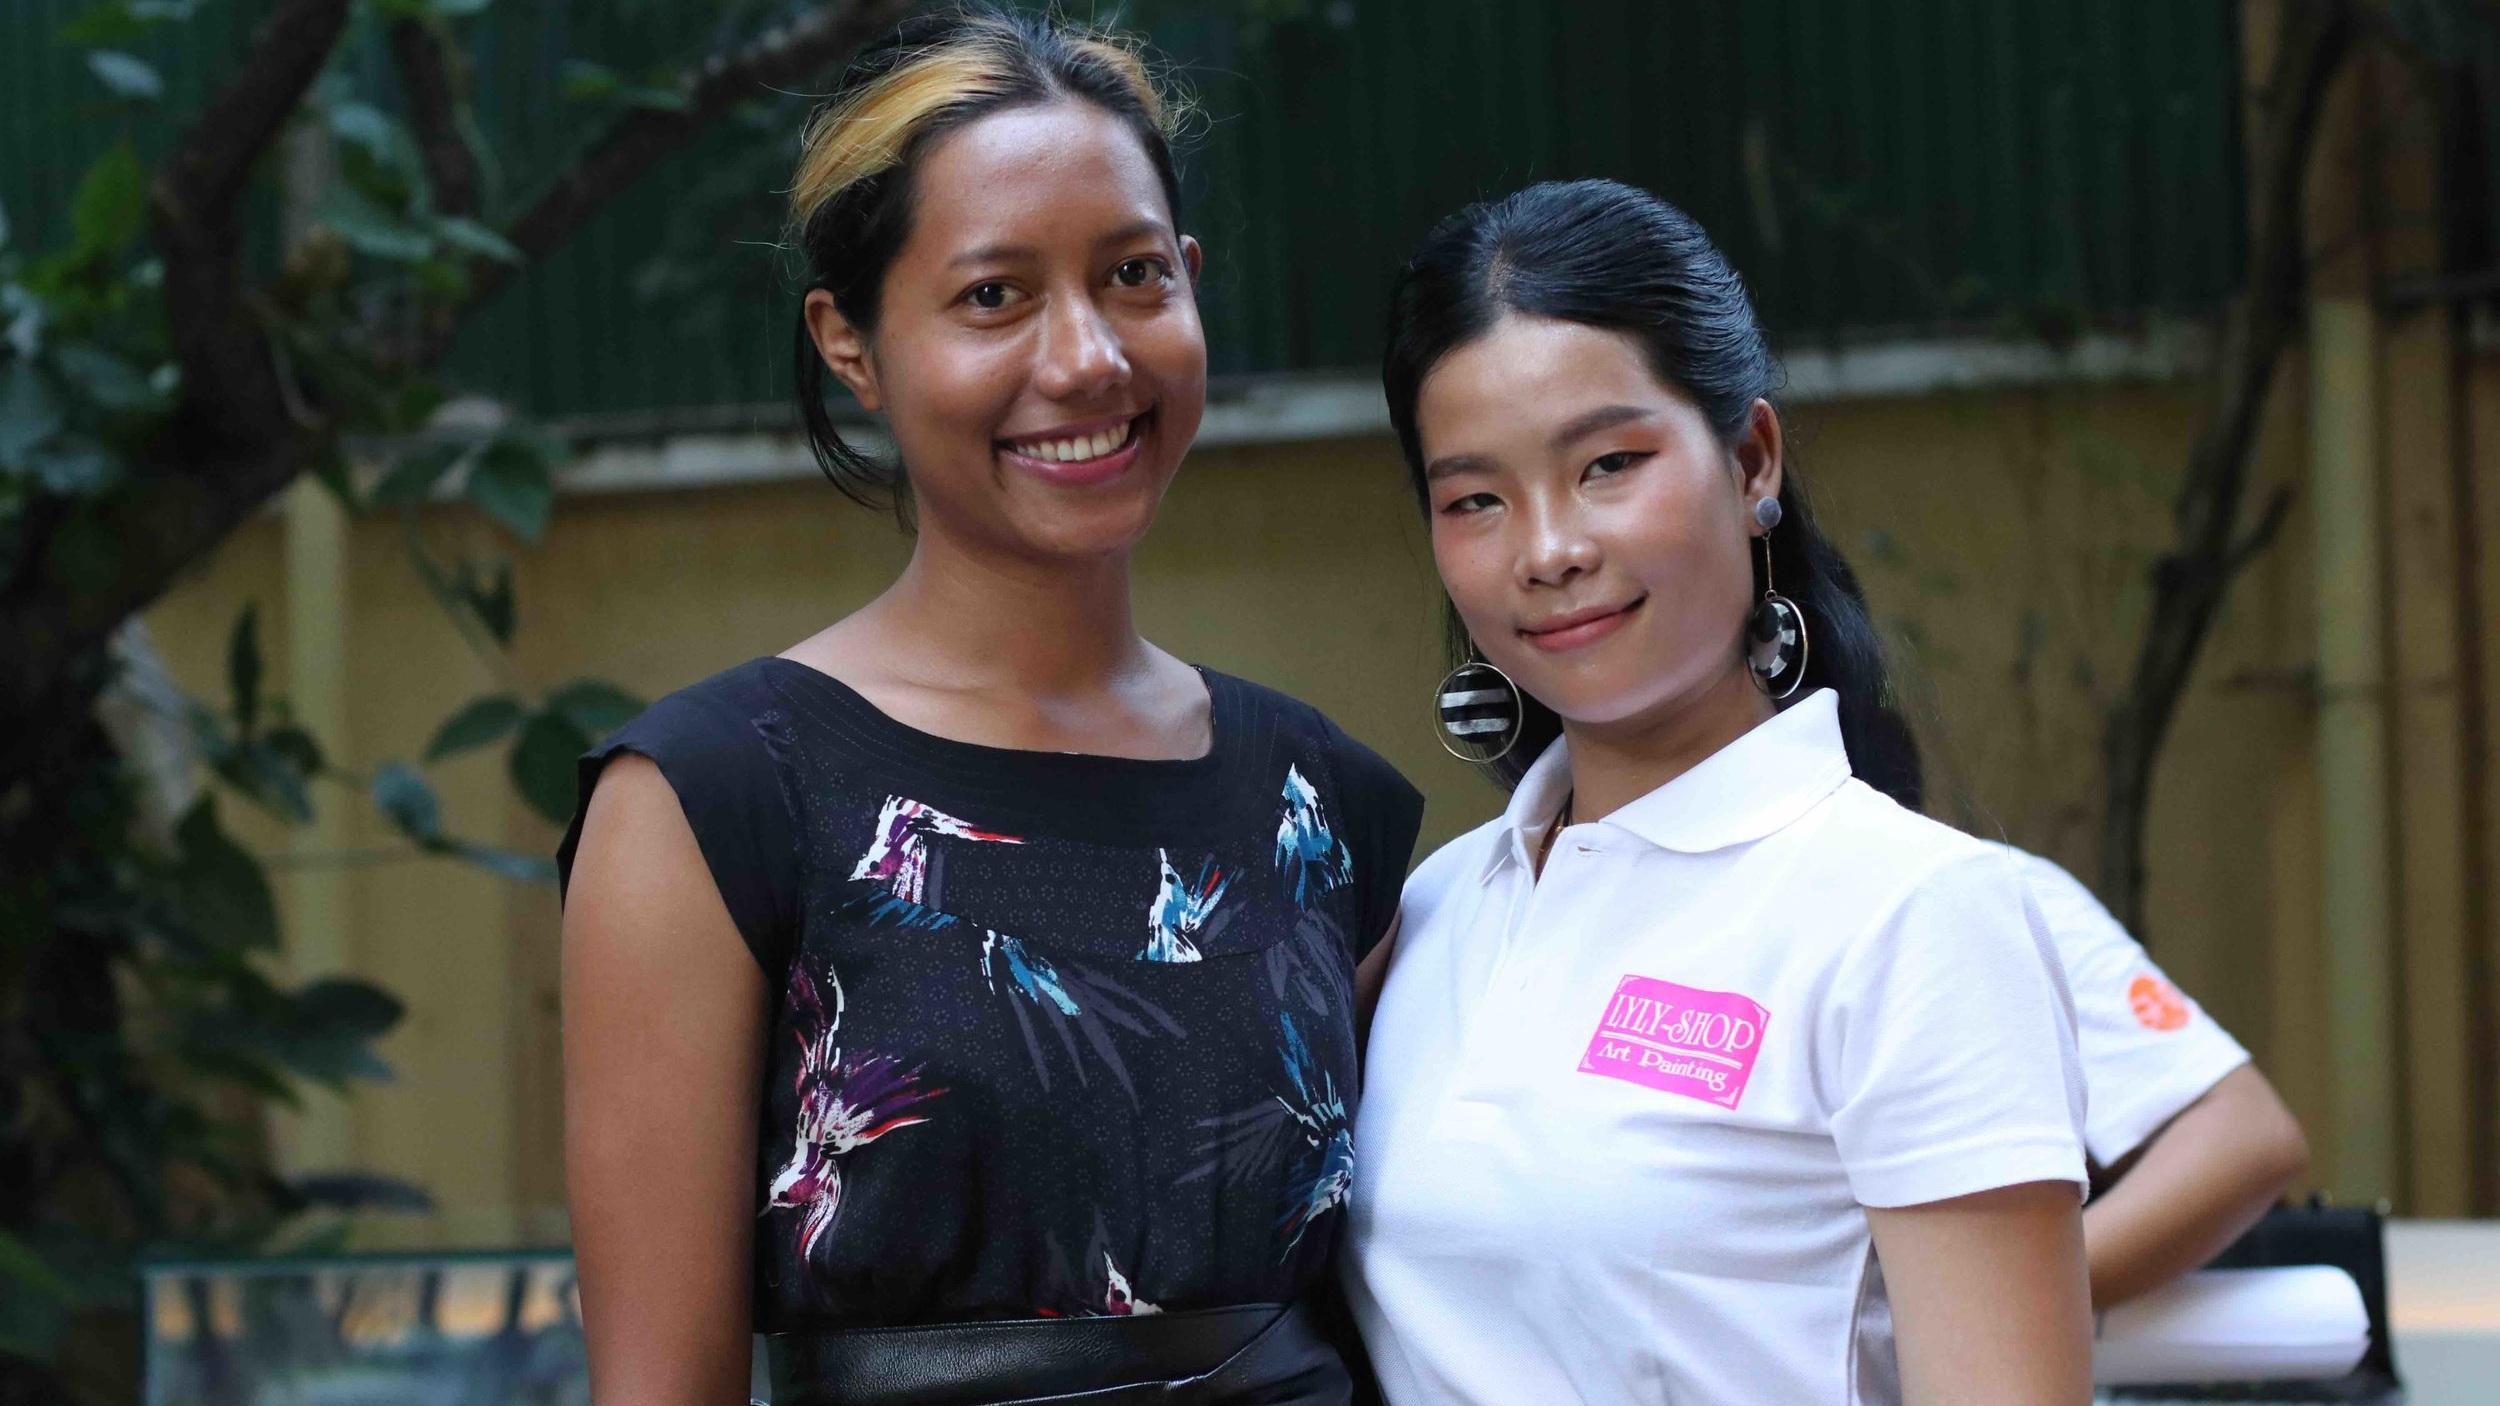 Vichka Vantha of Dai Khmer, and Hengly Eng of LYLY Shop